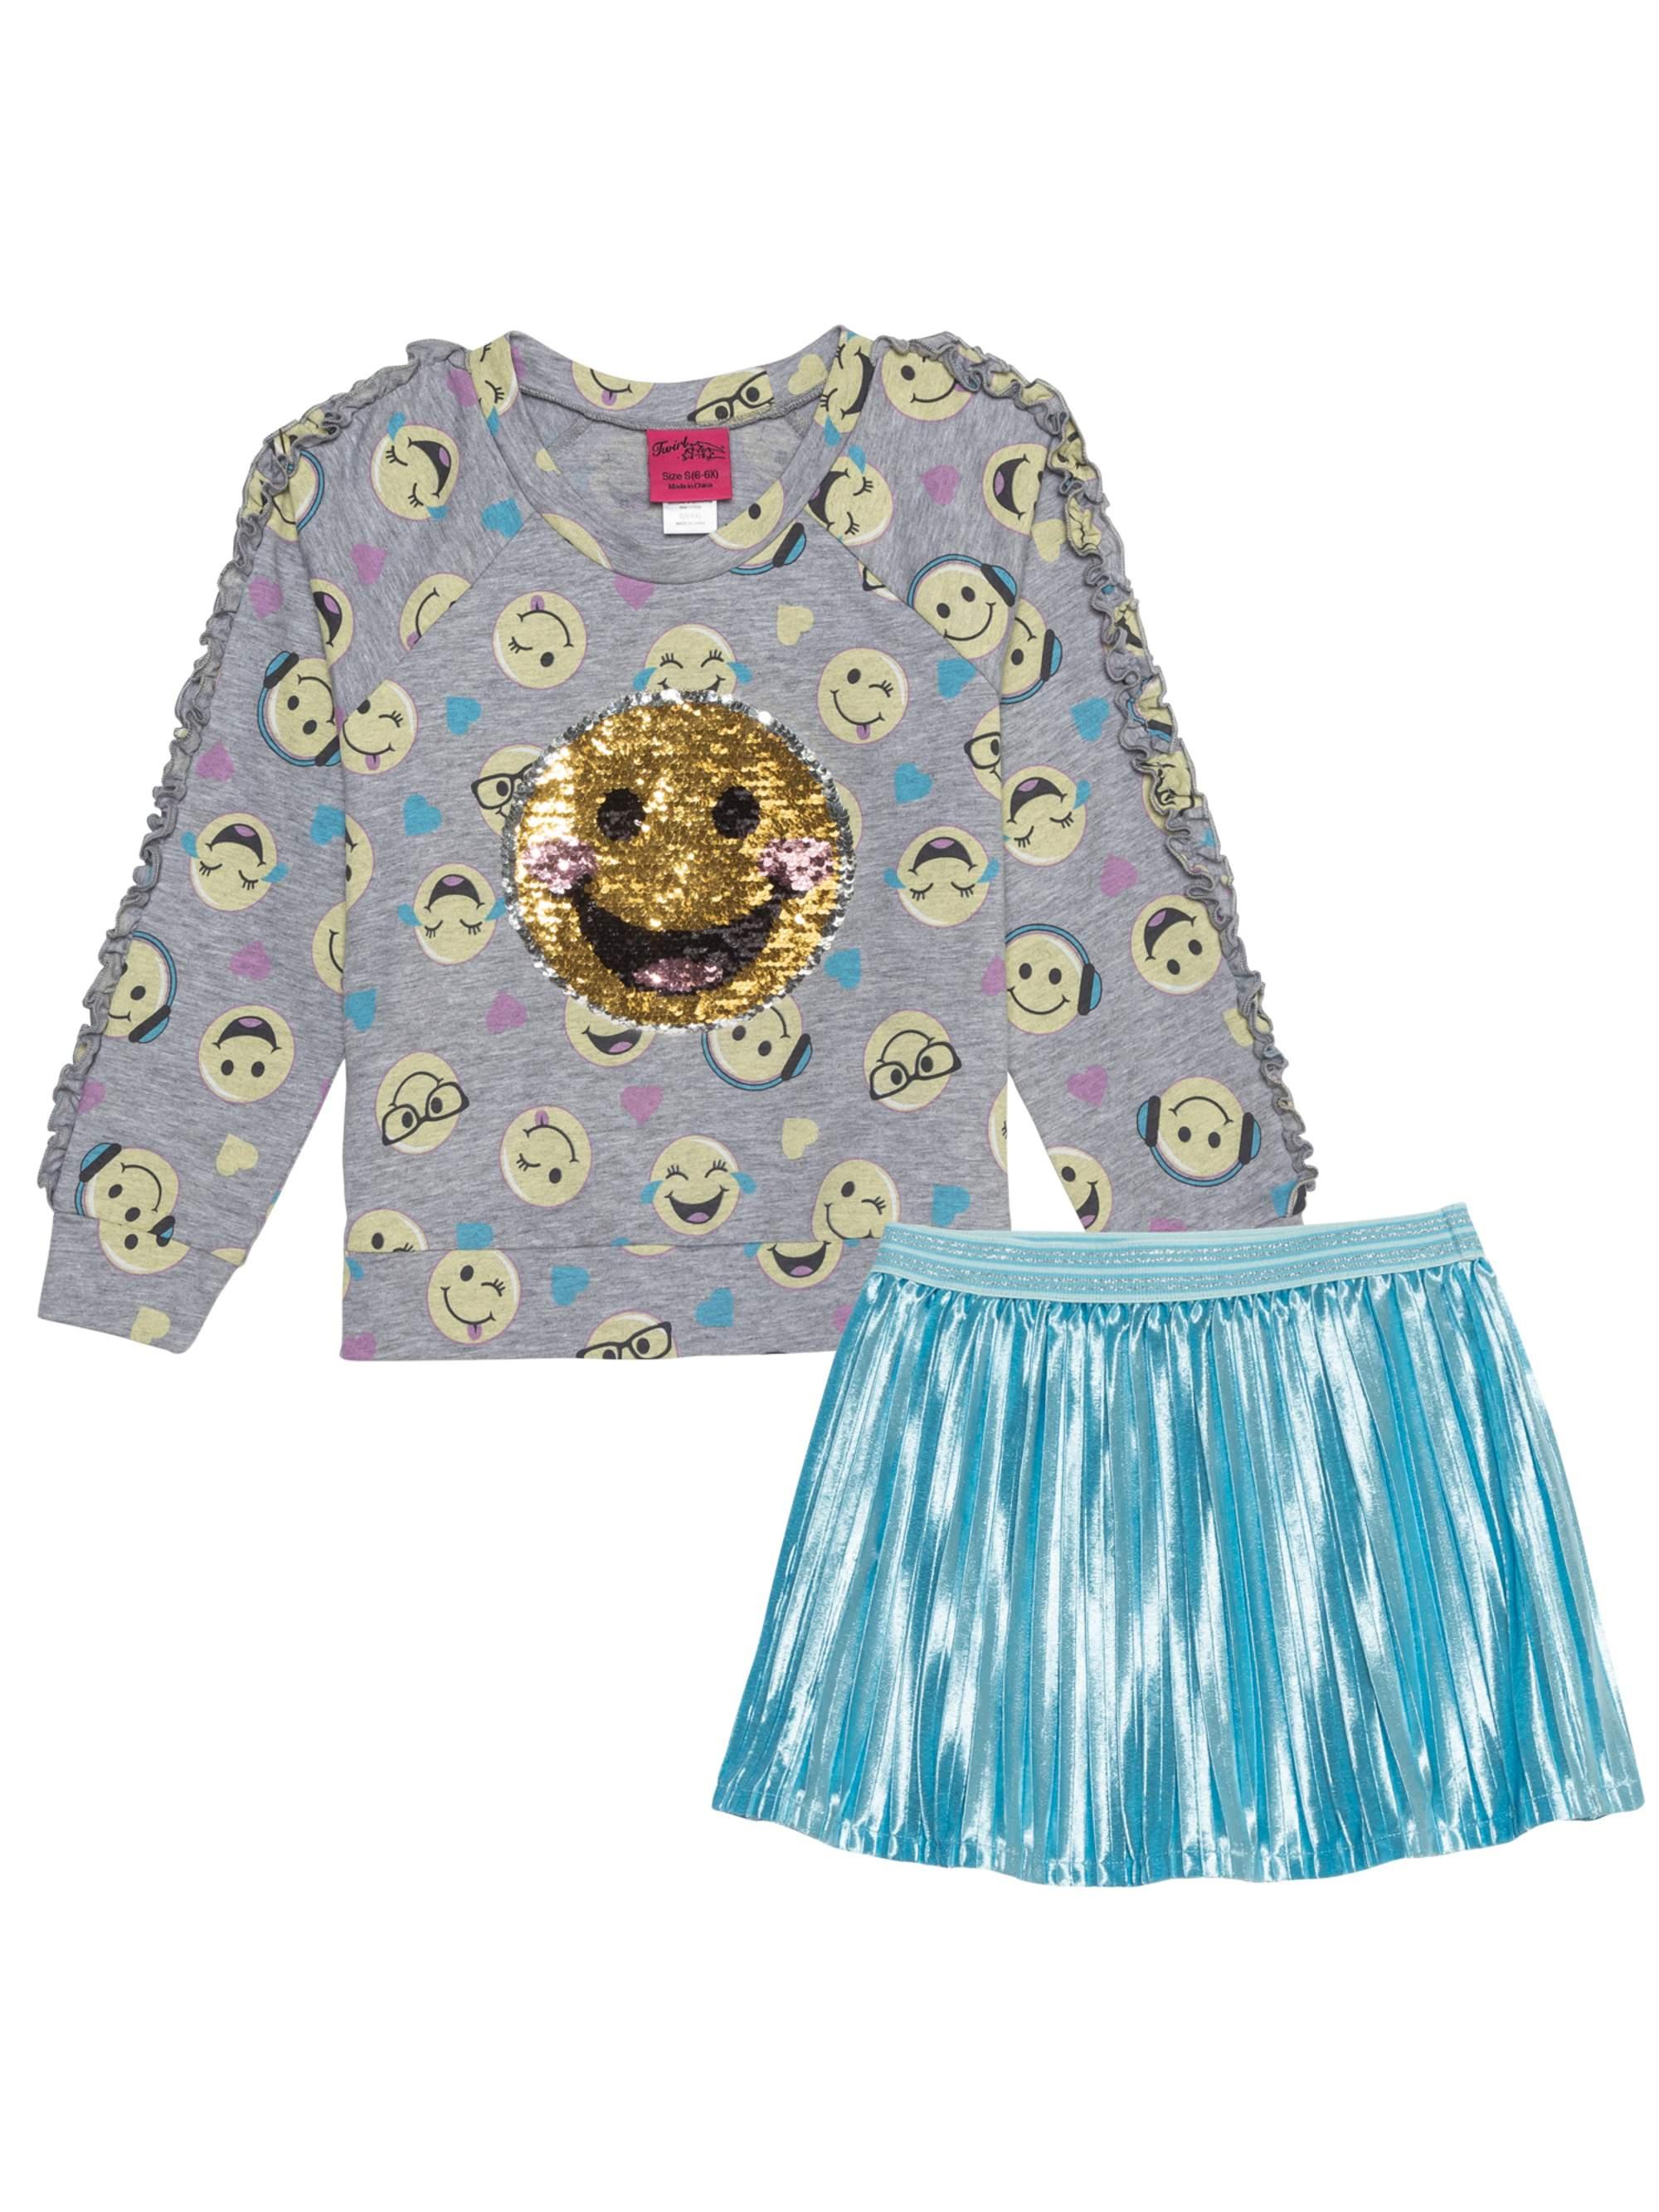 EMOJI Reversible Flip Sequin Sweatshirt and Pleated Skirt, 2-Piece Outfit Set (Little Girls & Big Girls)